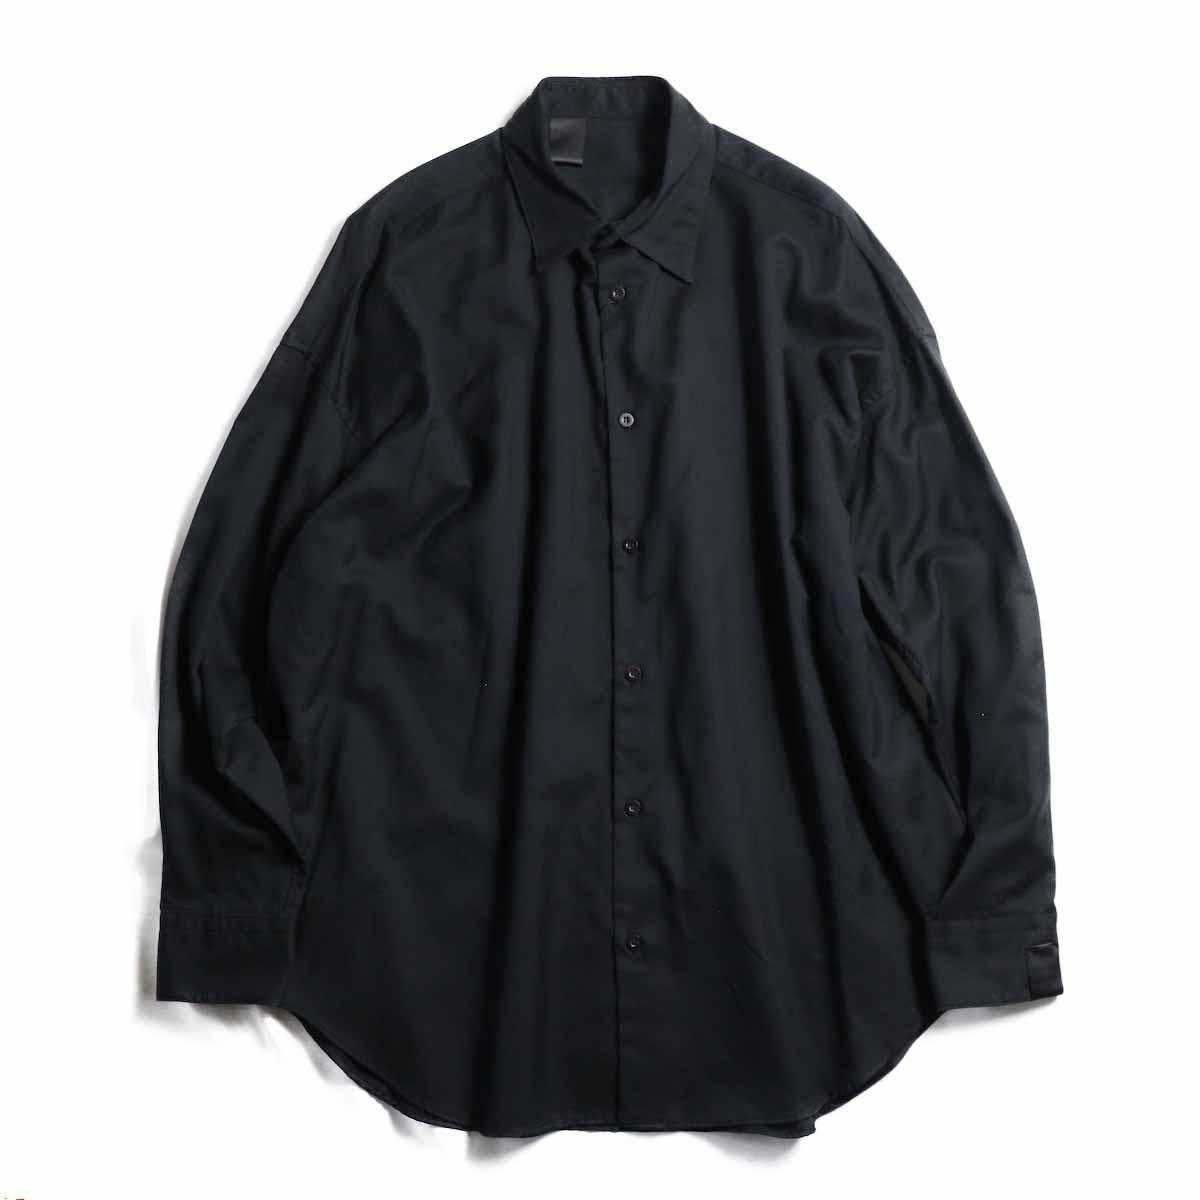 N.HOOLYWOOD / 282-SH09-012-peg LONG SLEEVE SHIRT -BLACK